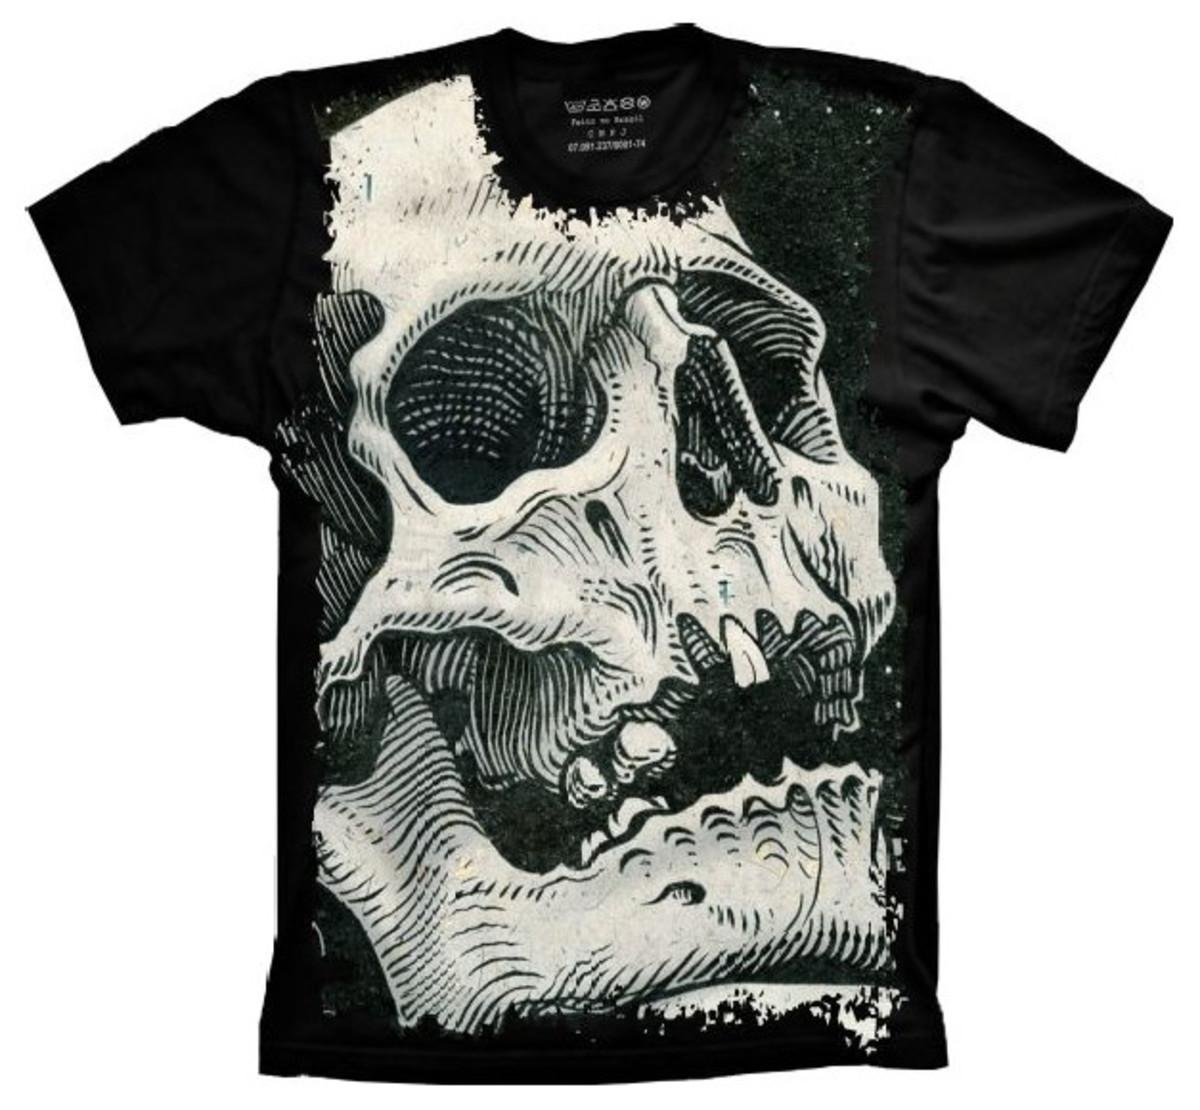 49cce3d0a Camiseta Skull Caveira Vintage no Elo7